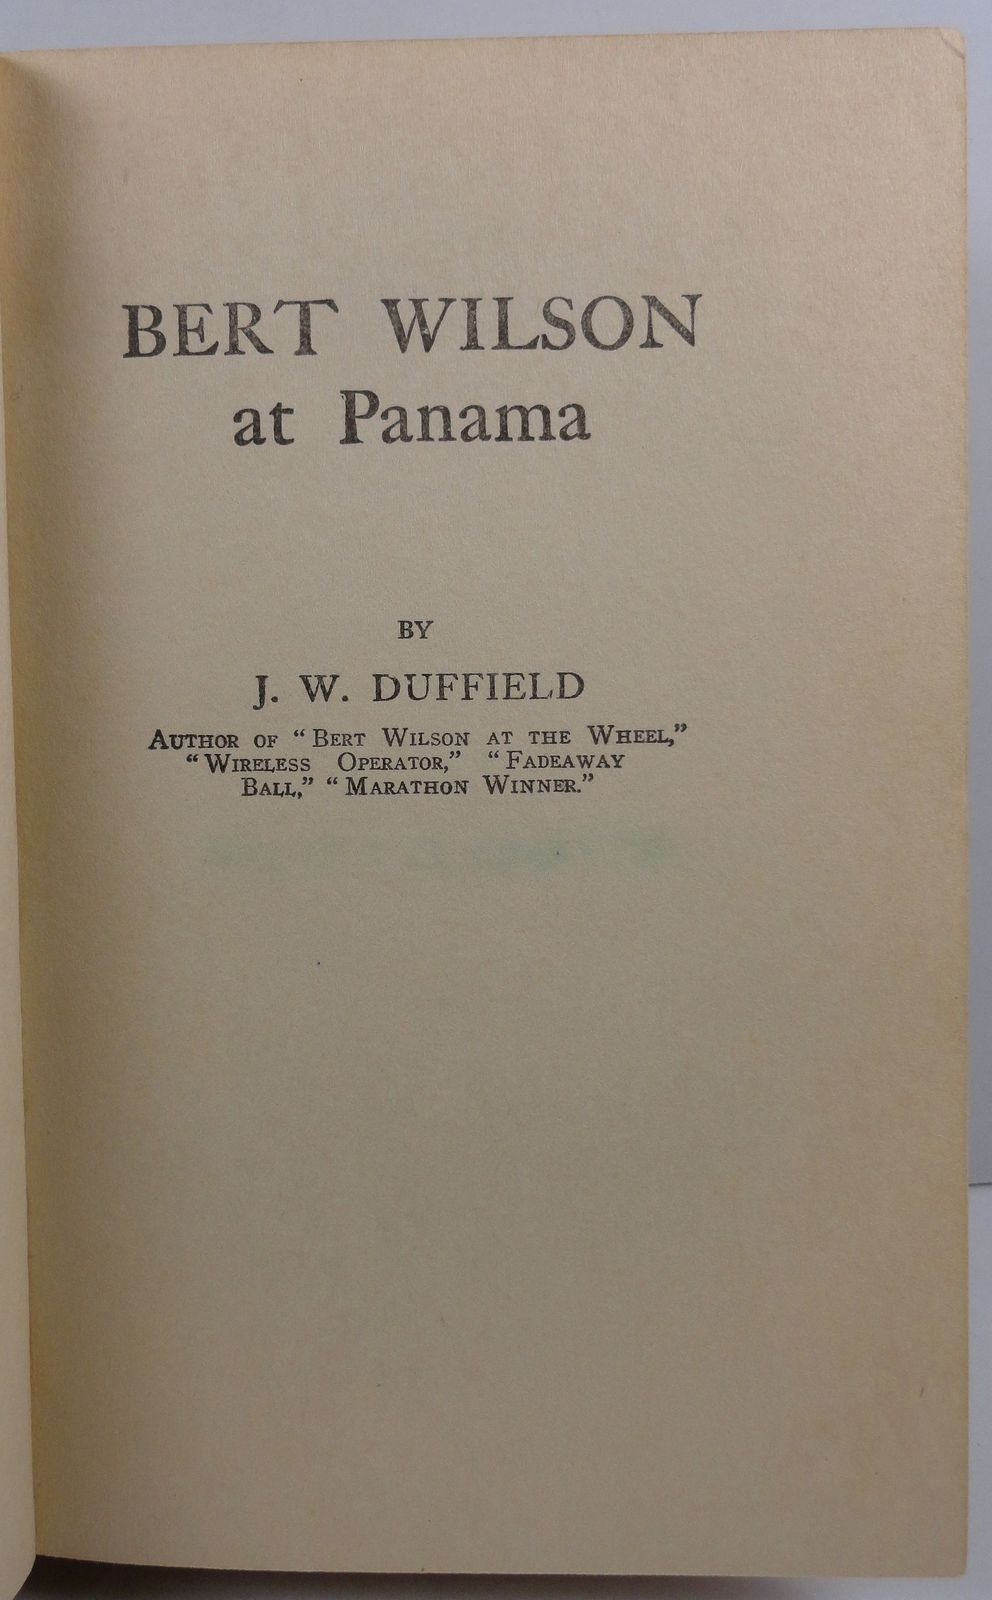 Bert Wilson at Panama by J. W. Duffield Western Printing